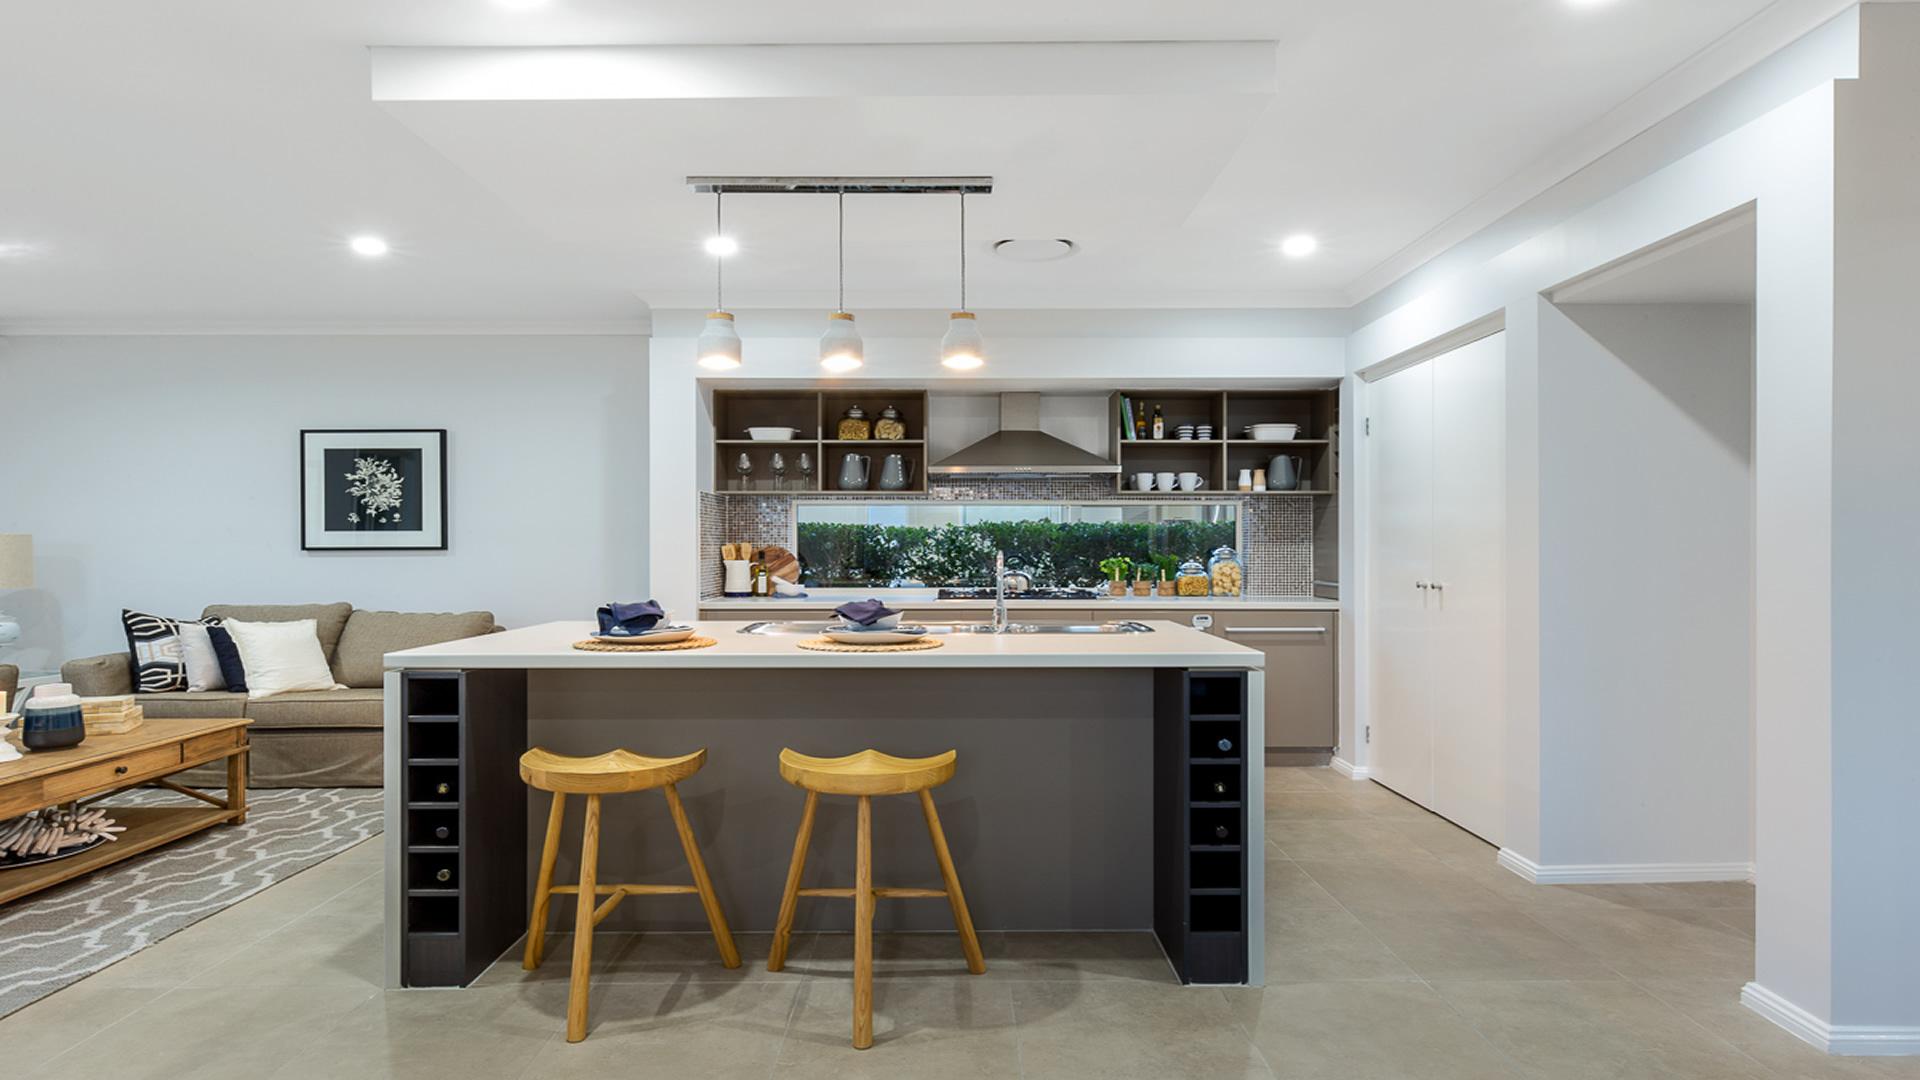 Cambridge Lifestyle Eden Brae Homes